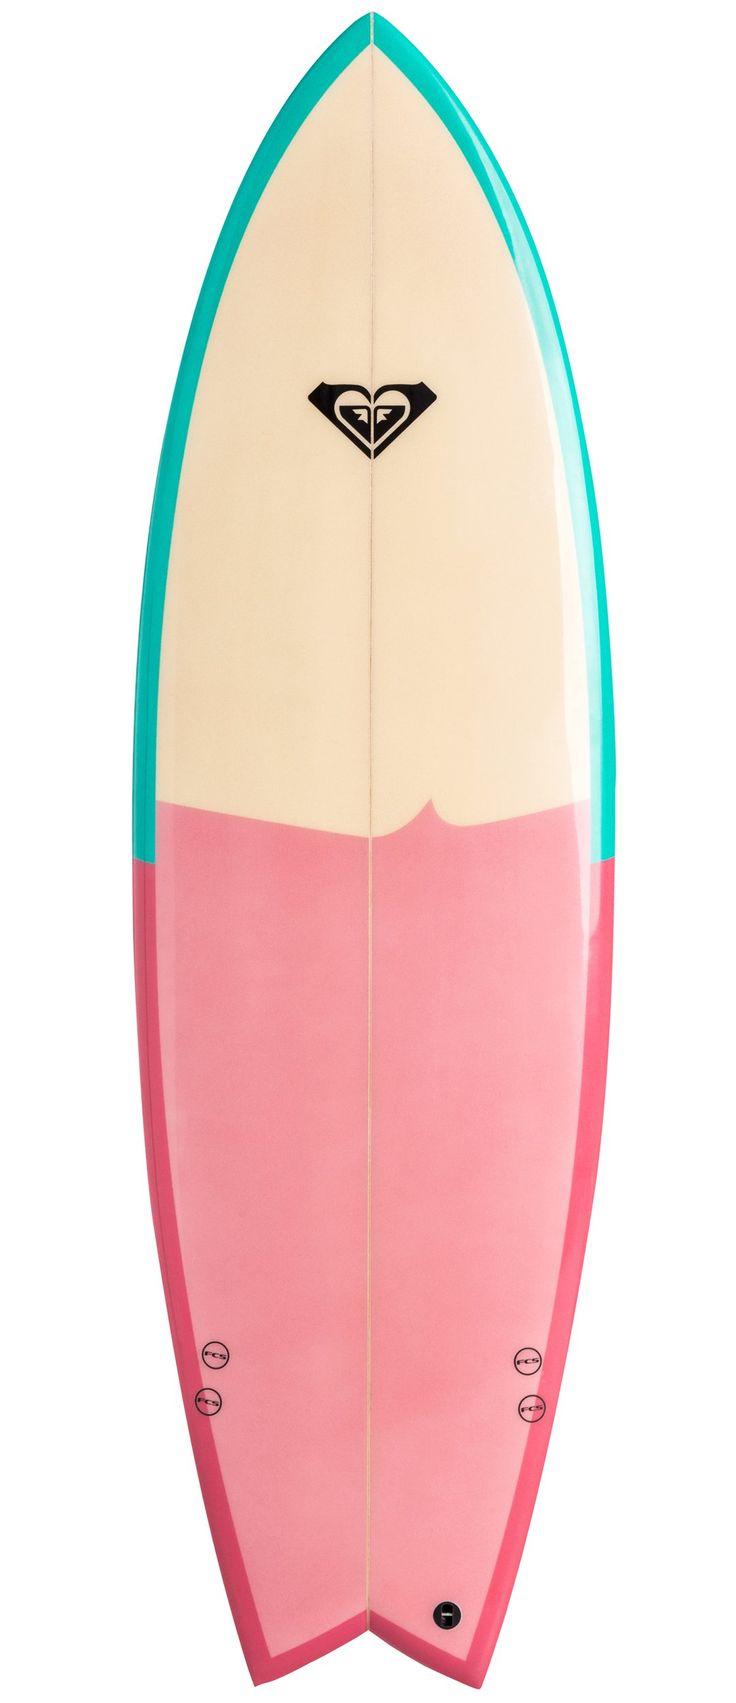 https://s-media-cache-ak0.pinimg.com/736x/fe/18/a0/fe18a01b51bd85053bd136db32907822.jpg Quiksilver Surfboards